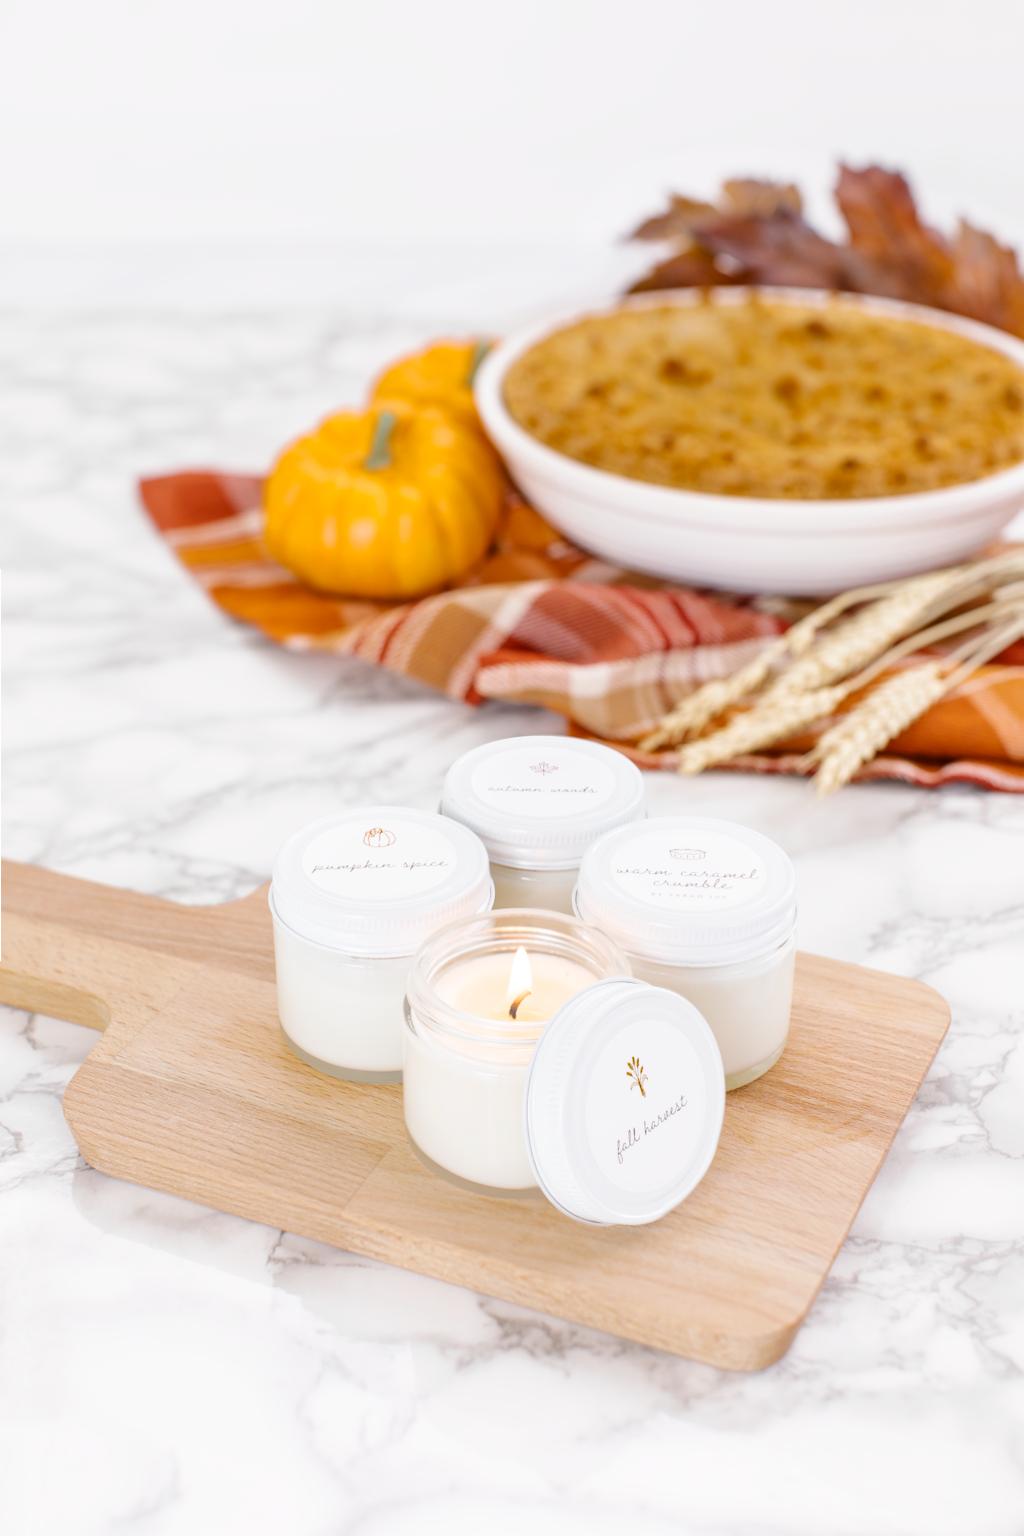 Fall Sample Pack of the best smelling candles on earth! kellyelko.com #fall #fallcandles #falldecor #fallfarmhouse #farmhousedecor